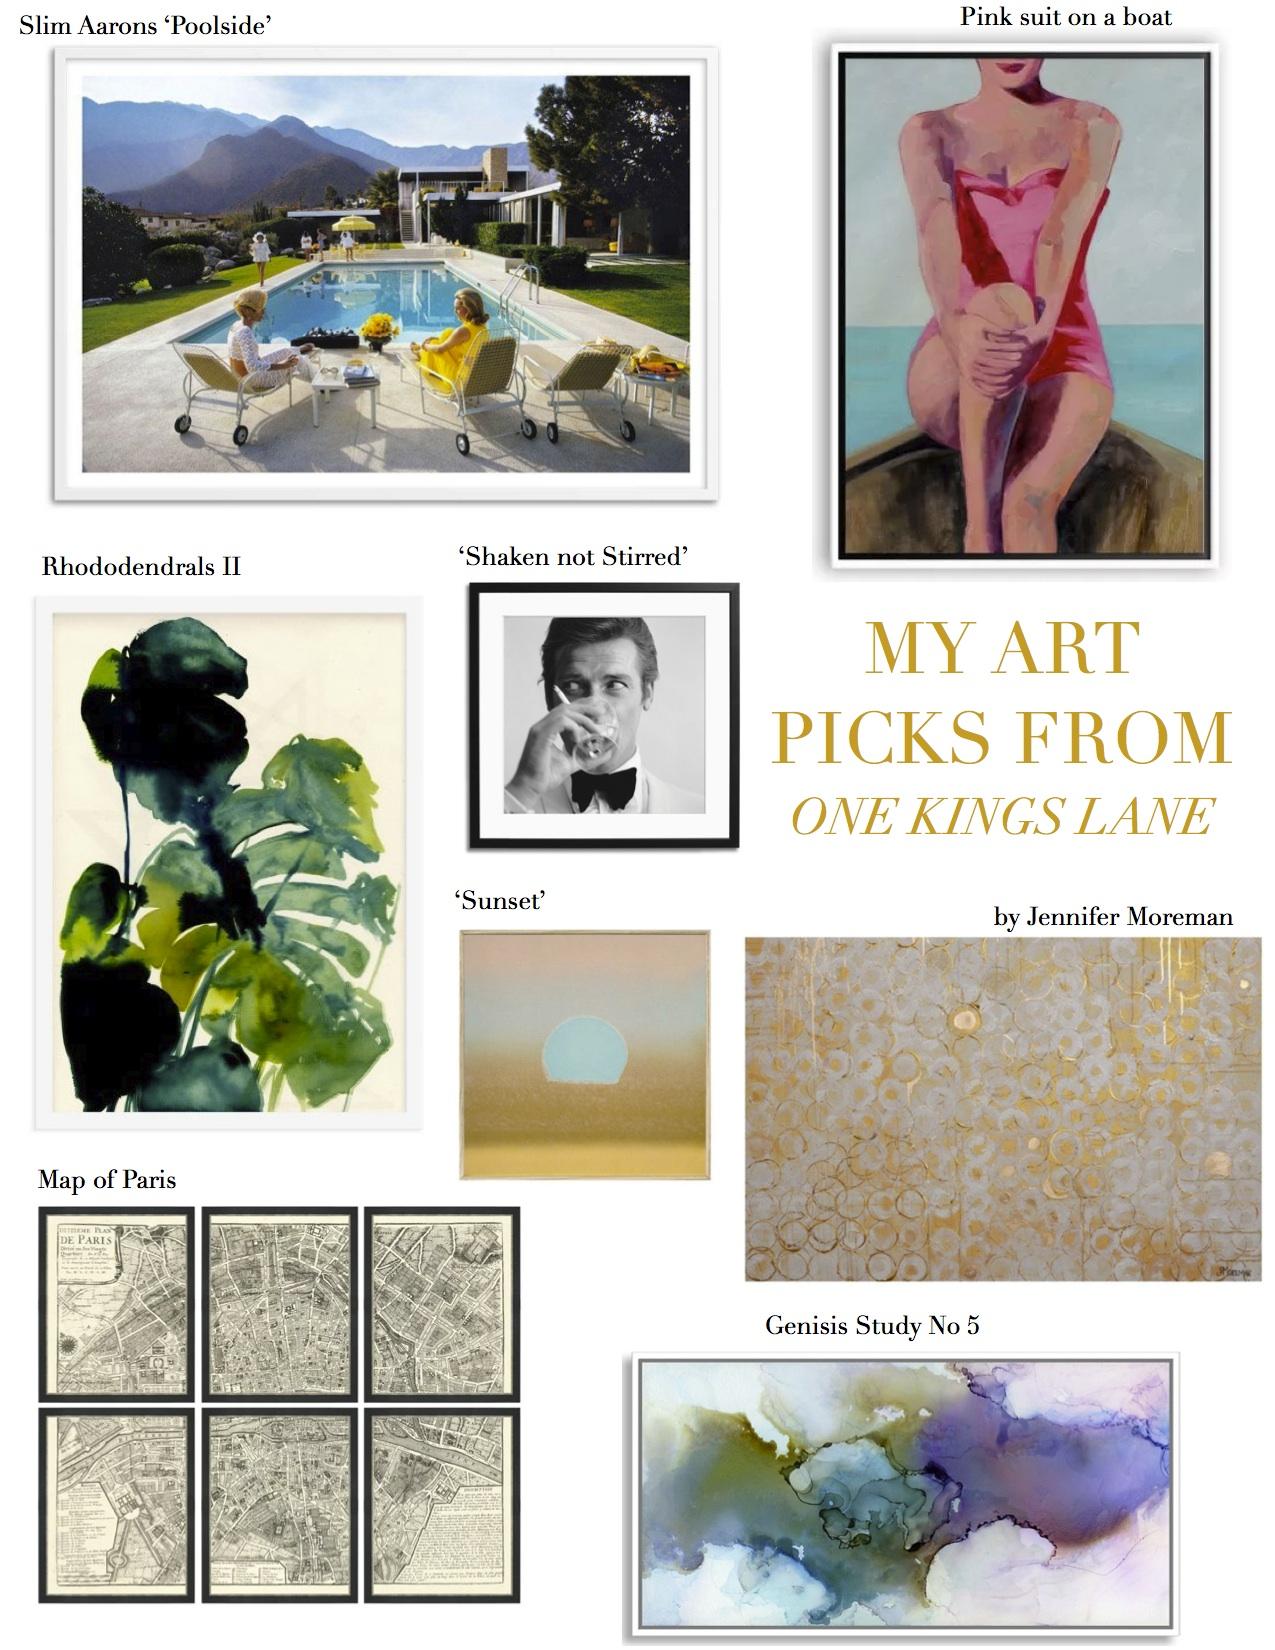 One Kings Lane - Art selections - The Decorista